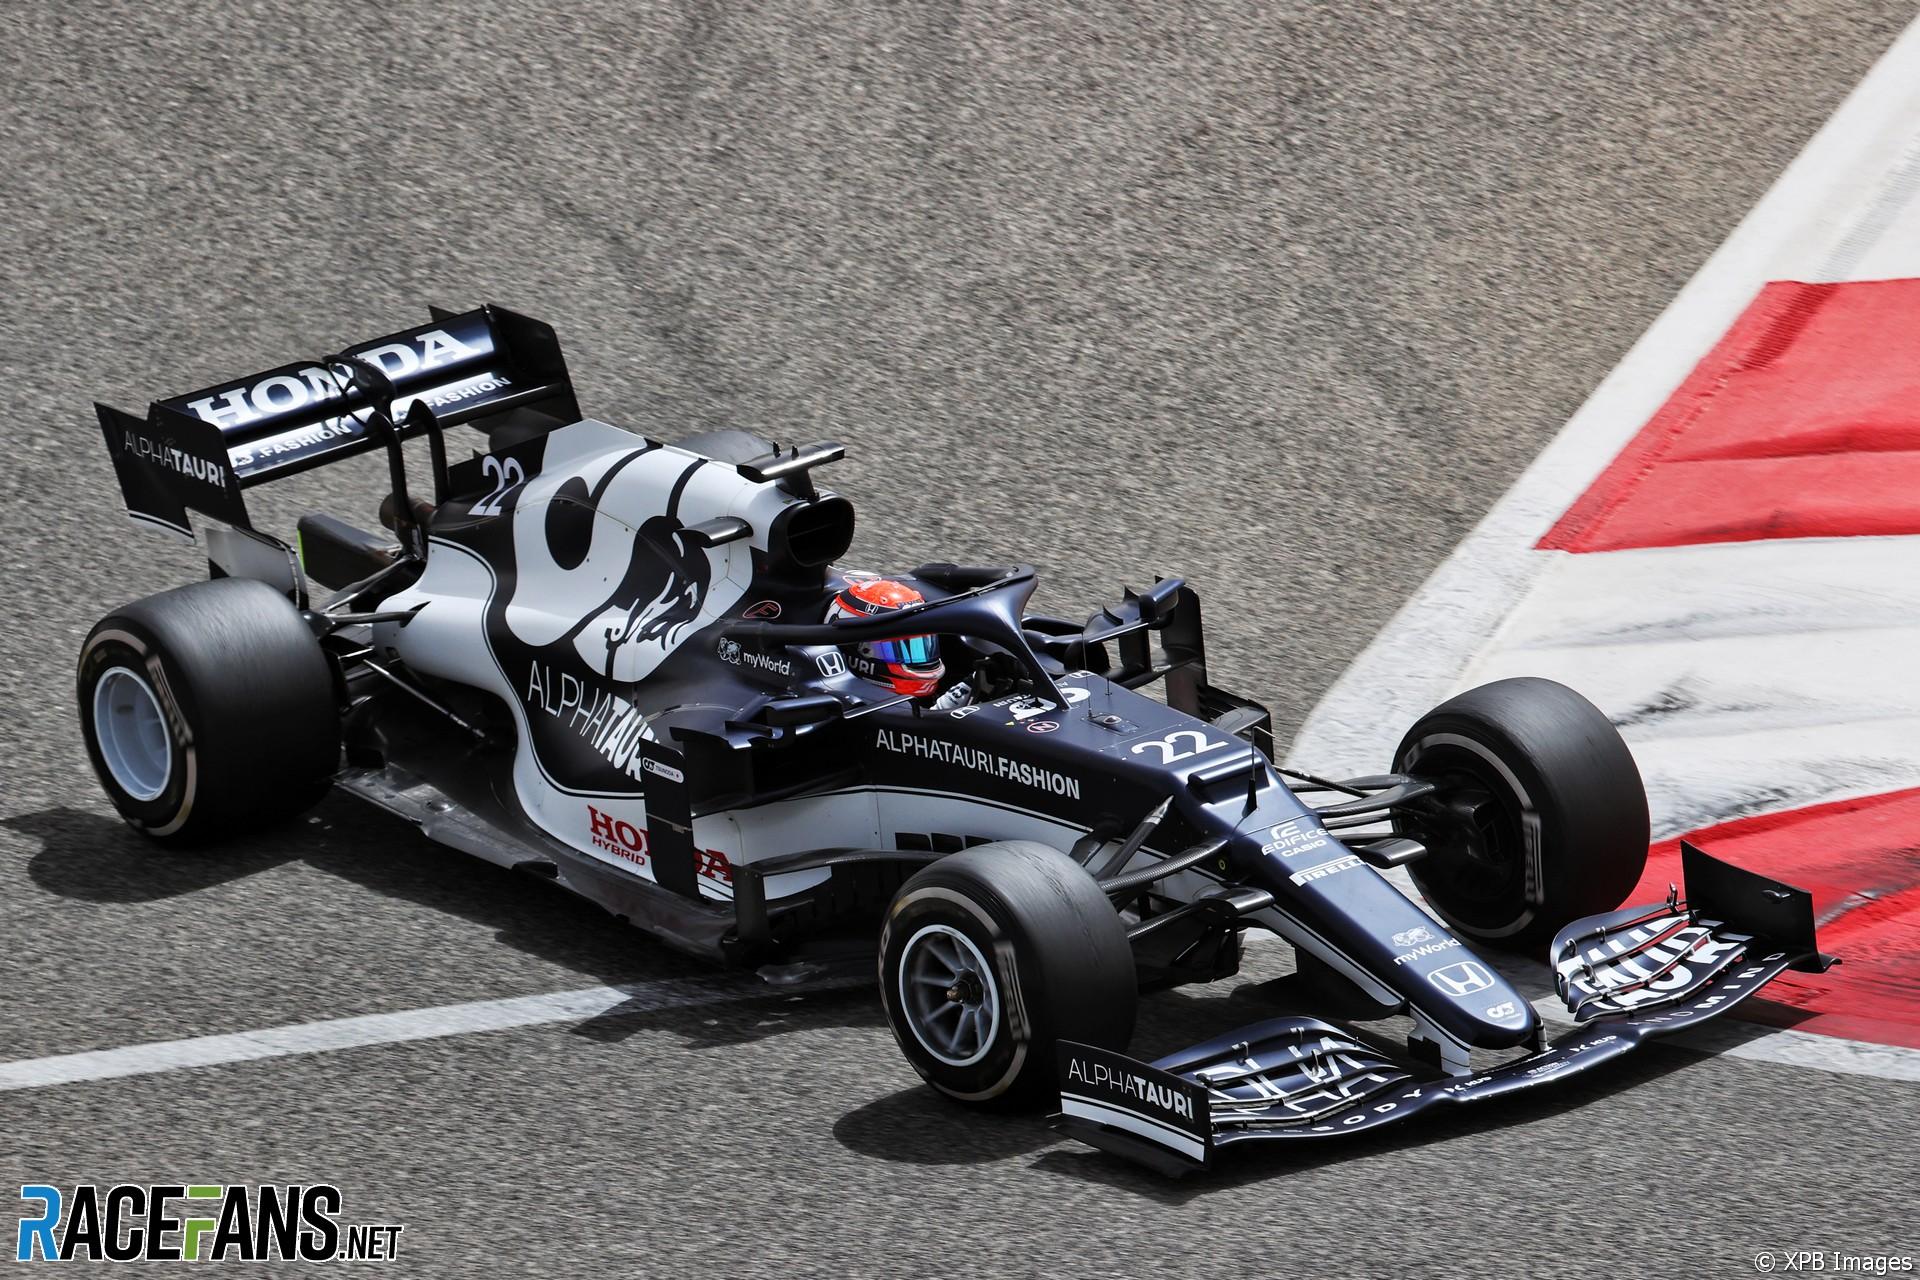 Yuki Tsunoda, AlphaTauri, Circuito Internacional de Baréin, 2021